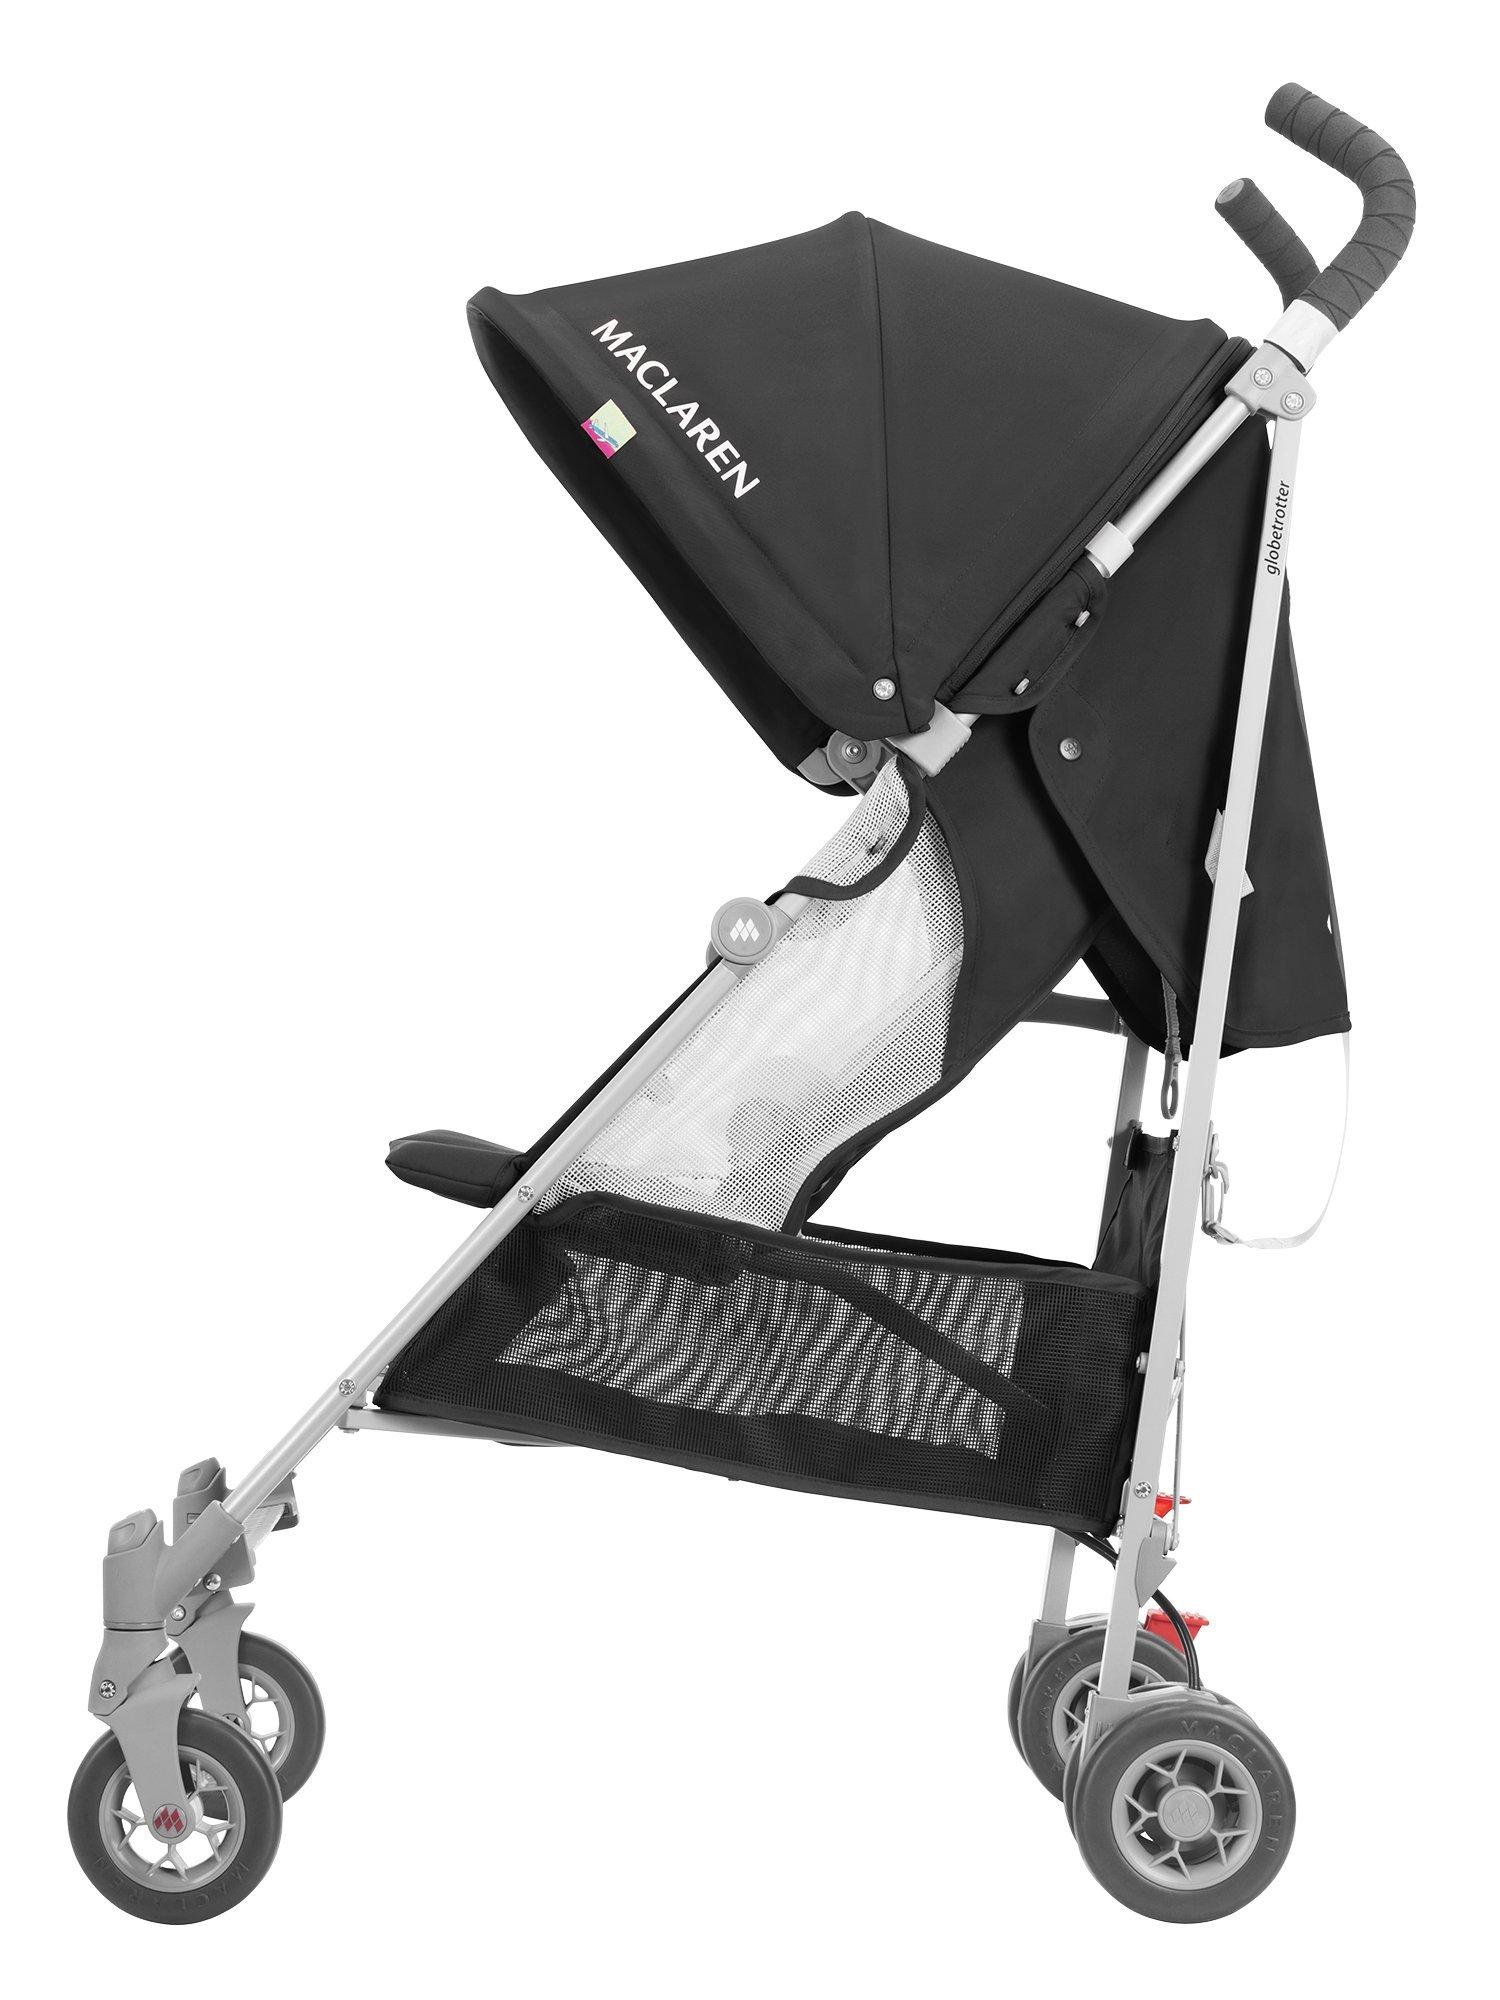 Maclaren Globetrotter Stroller - lightweight, compact by Maclaren (Image #6)